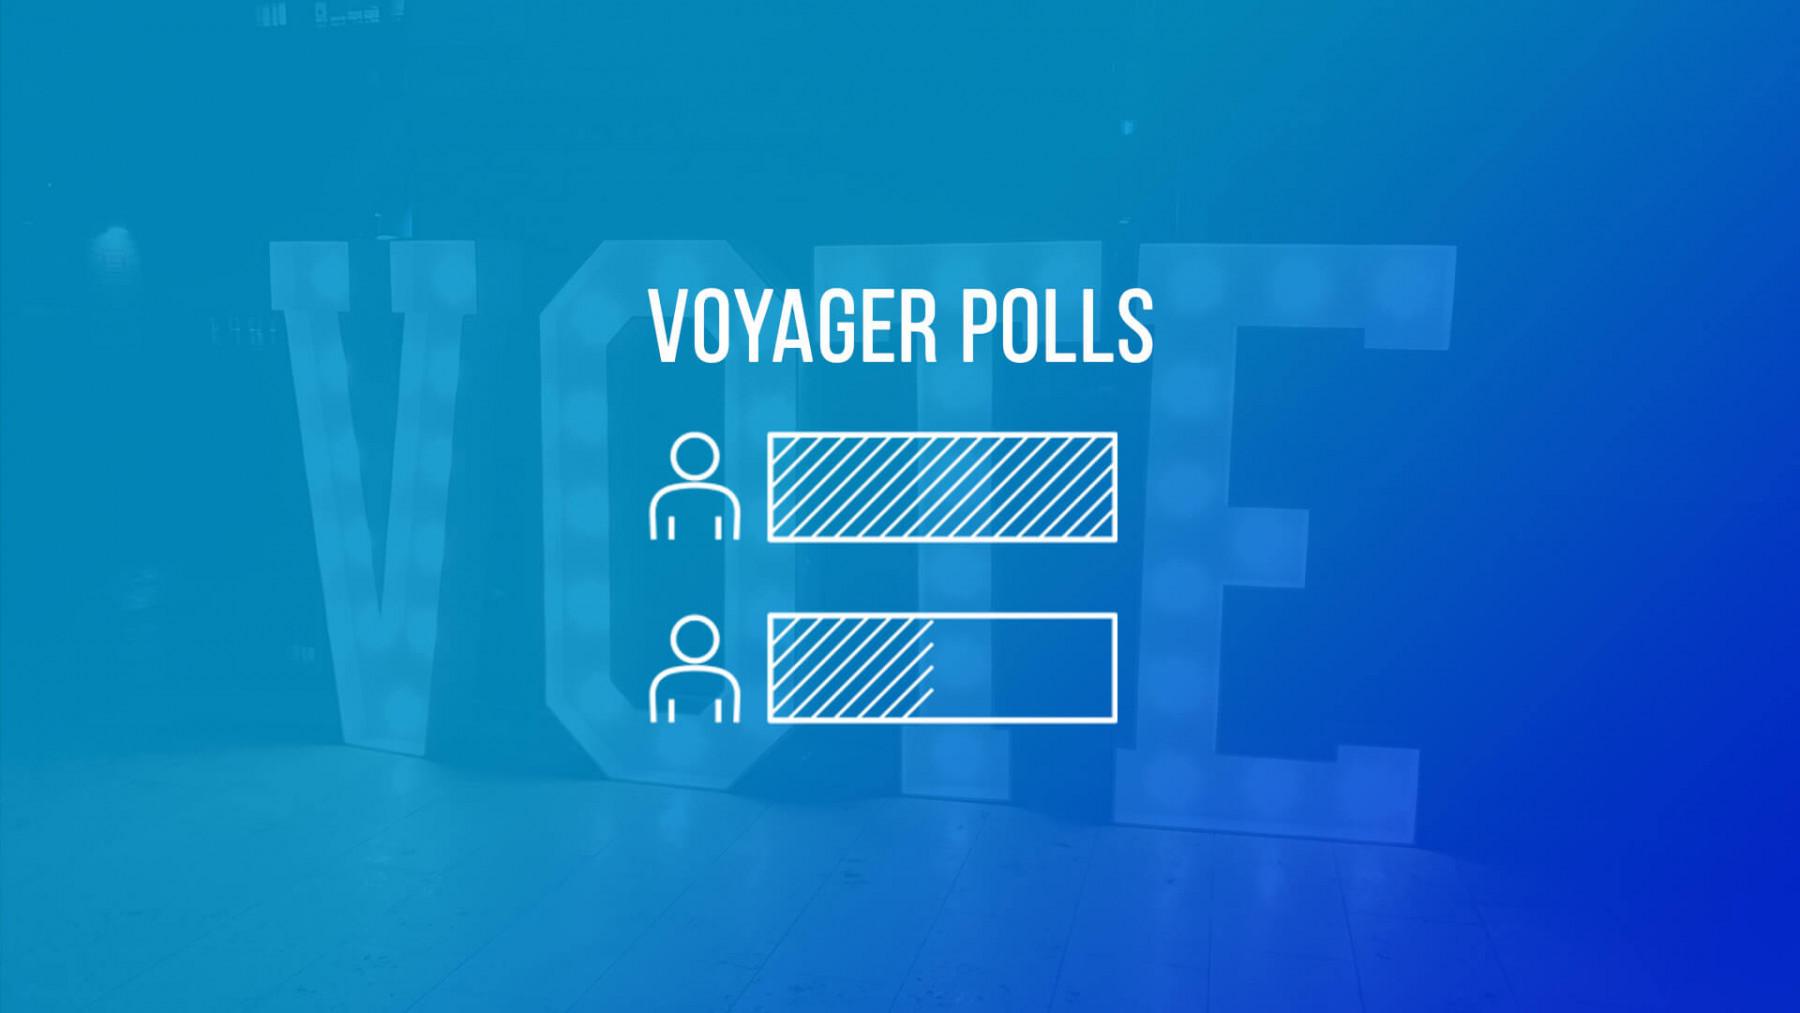 Voyager Polls